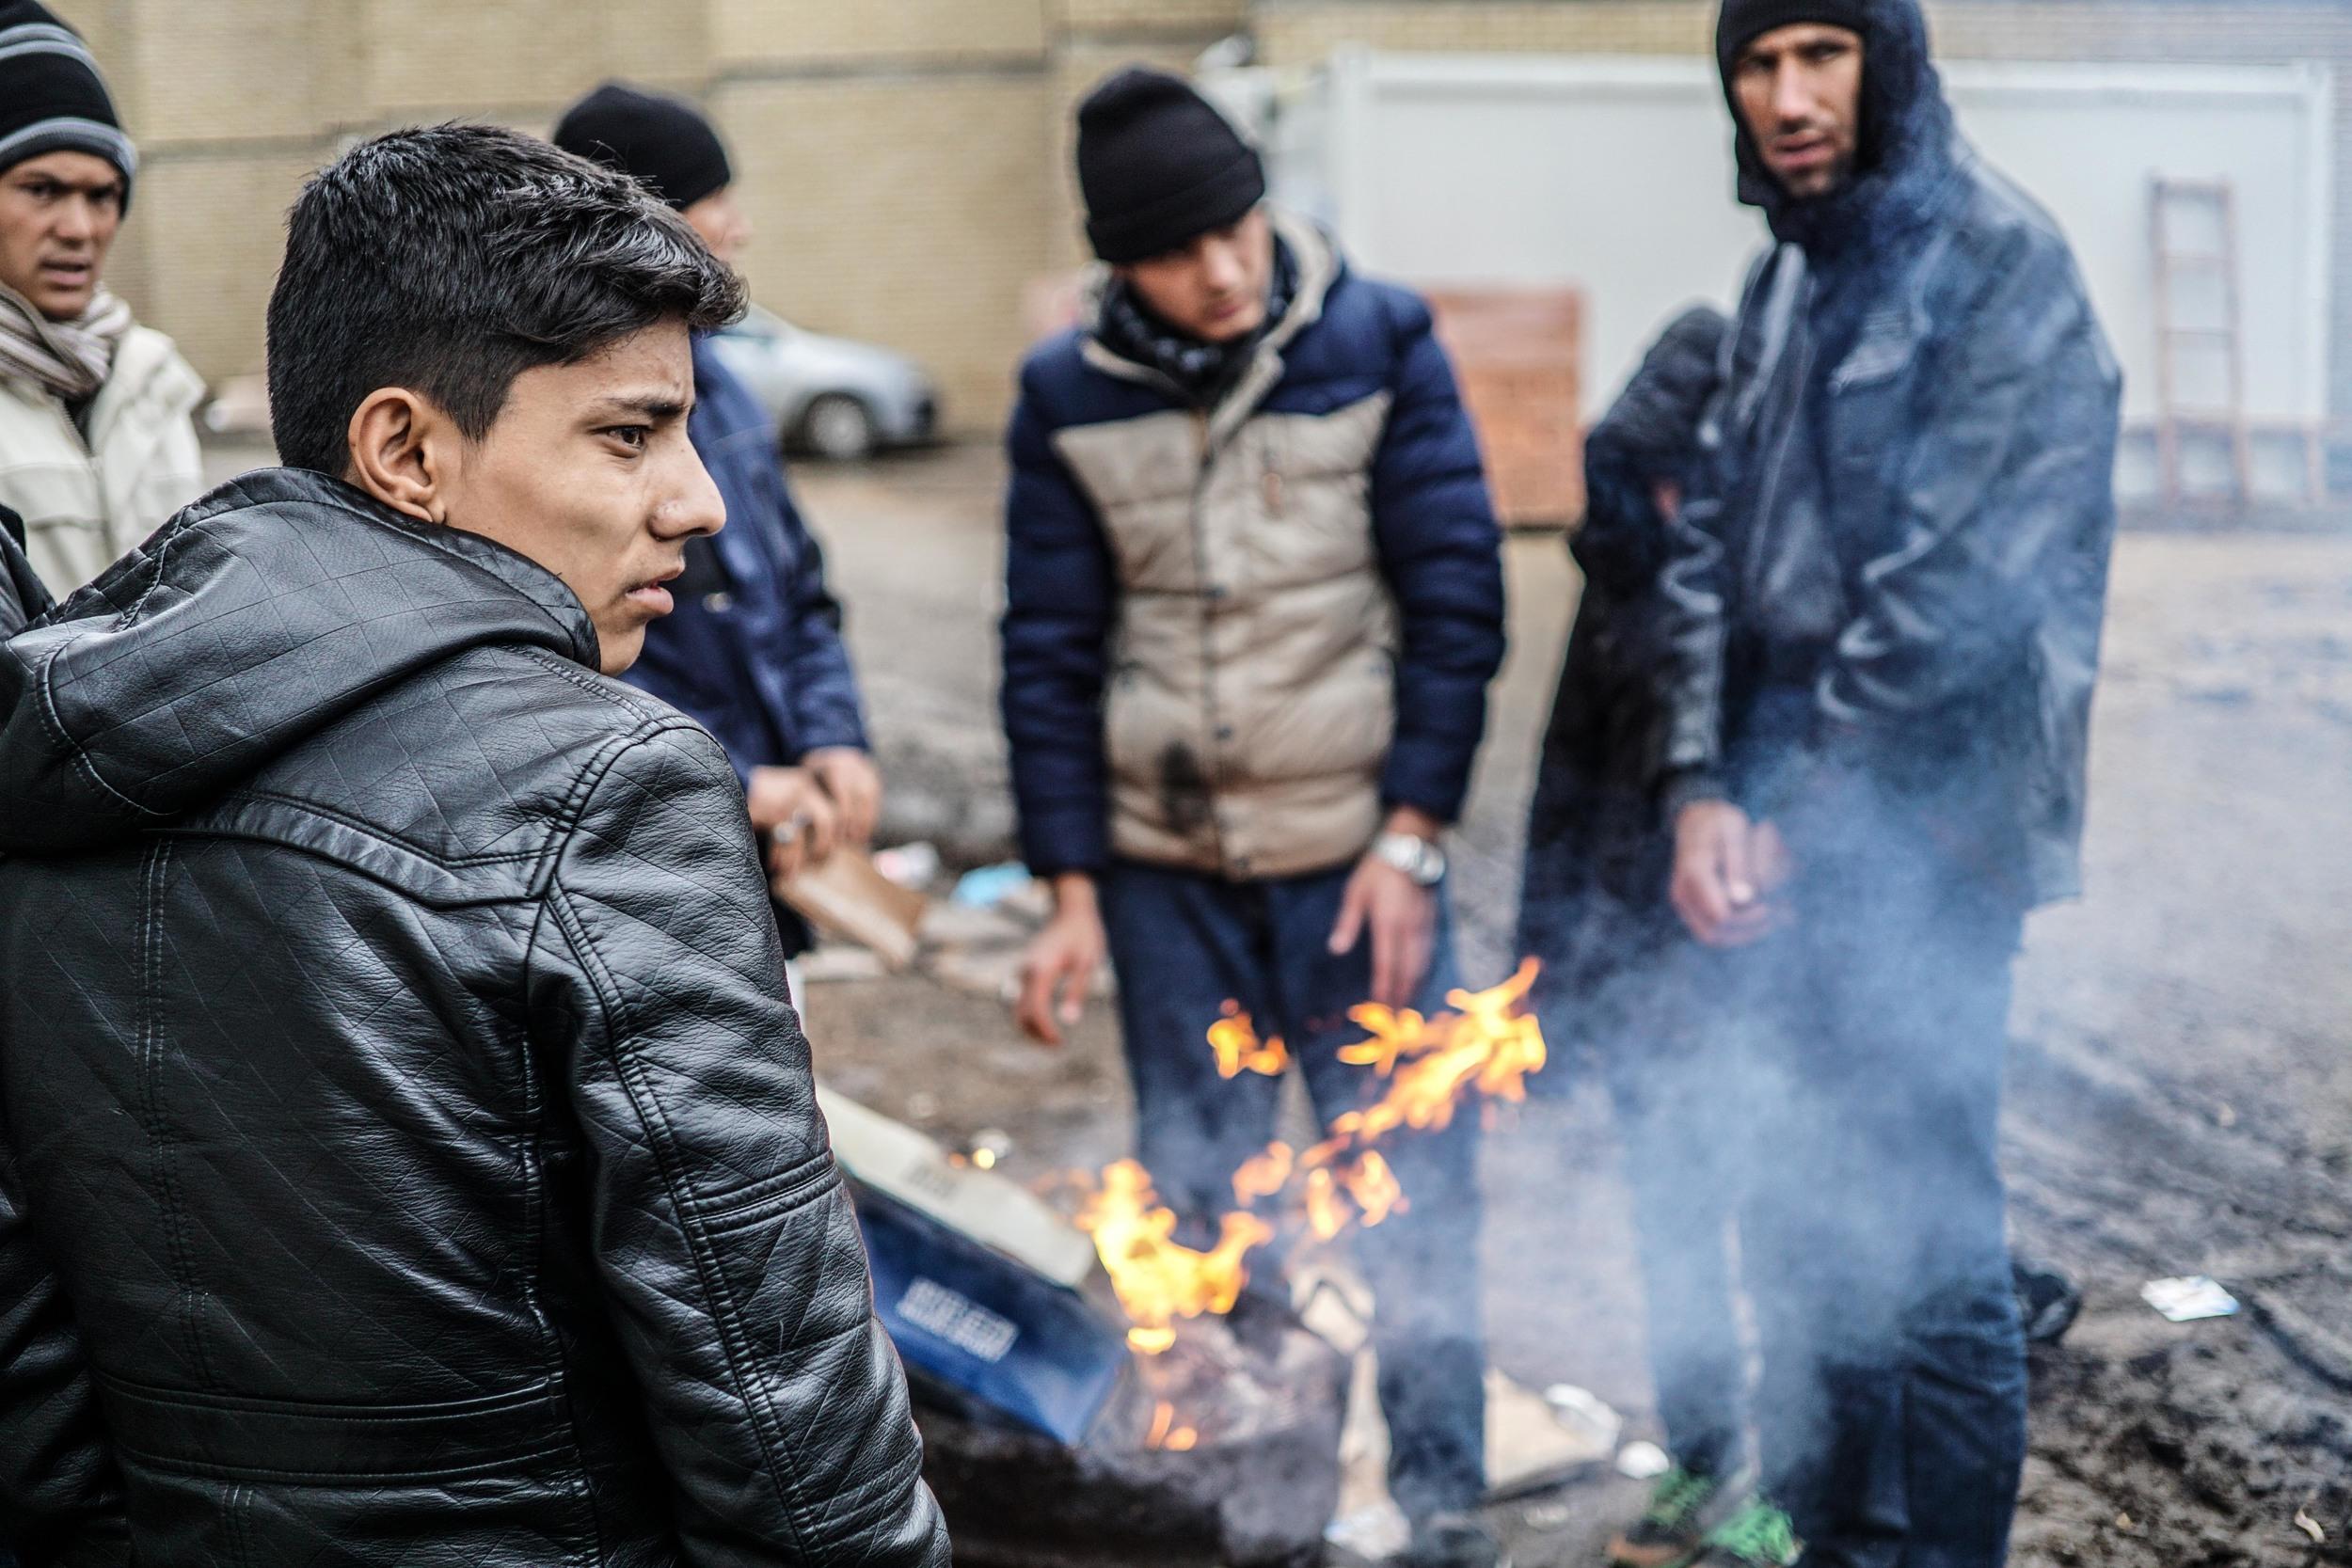 Syrian Refugee Crisis Serbia November 2015 3.jpg